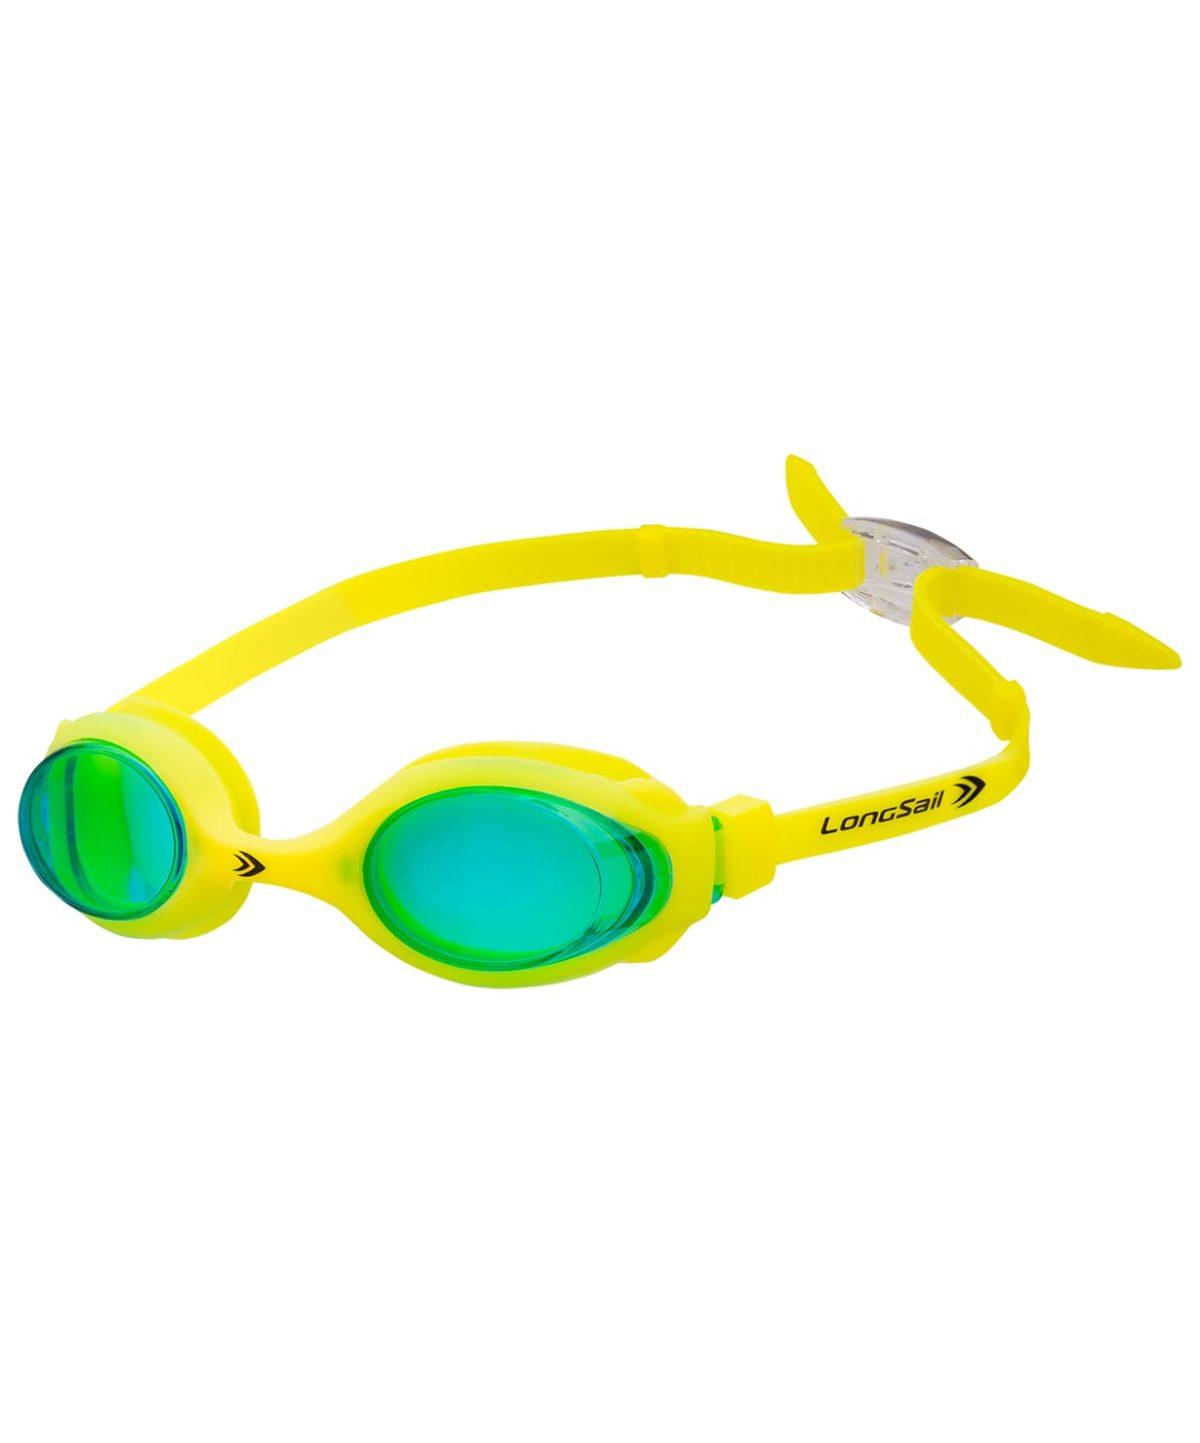 LONGSAIL Kids Marine Очки для плавания  L041020: зеленый/желтый - 1